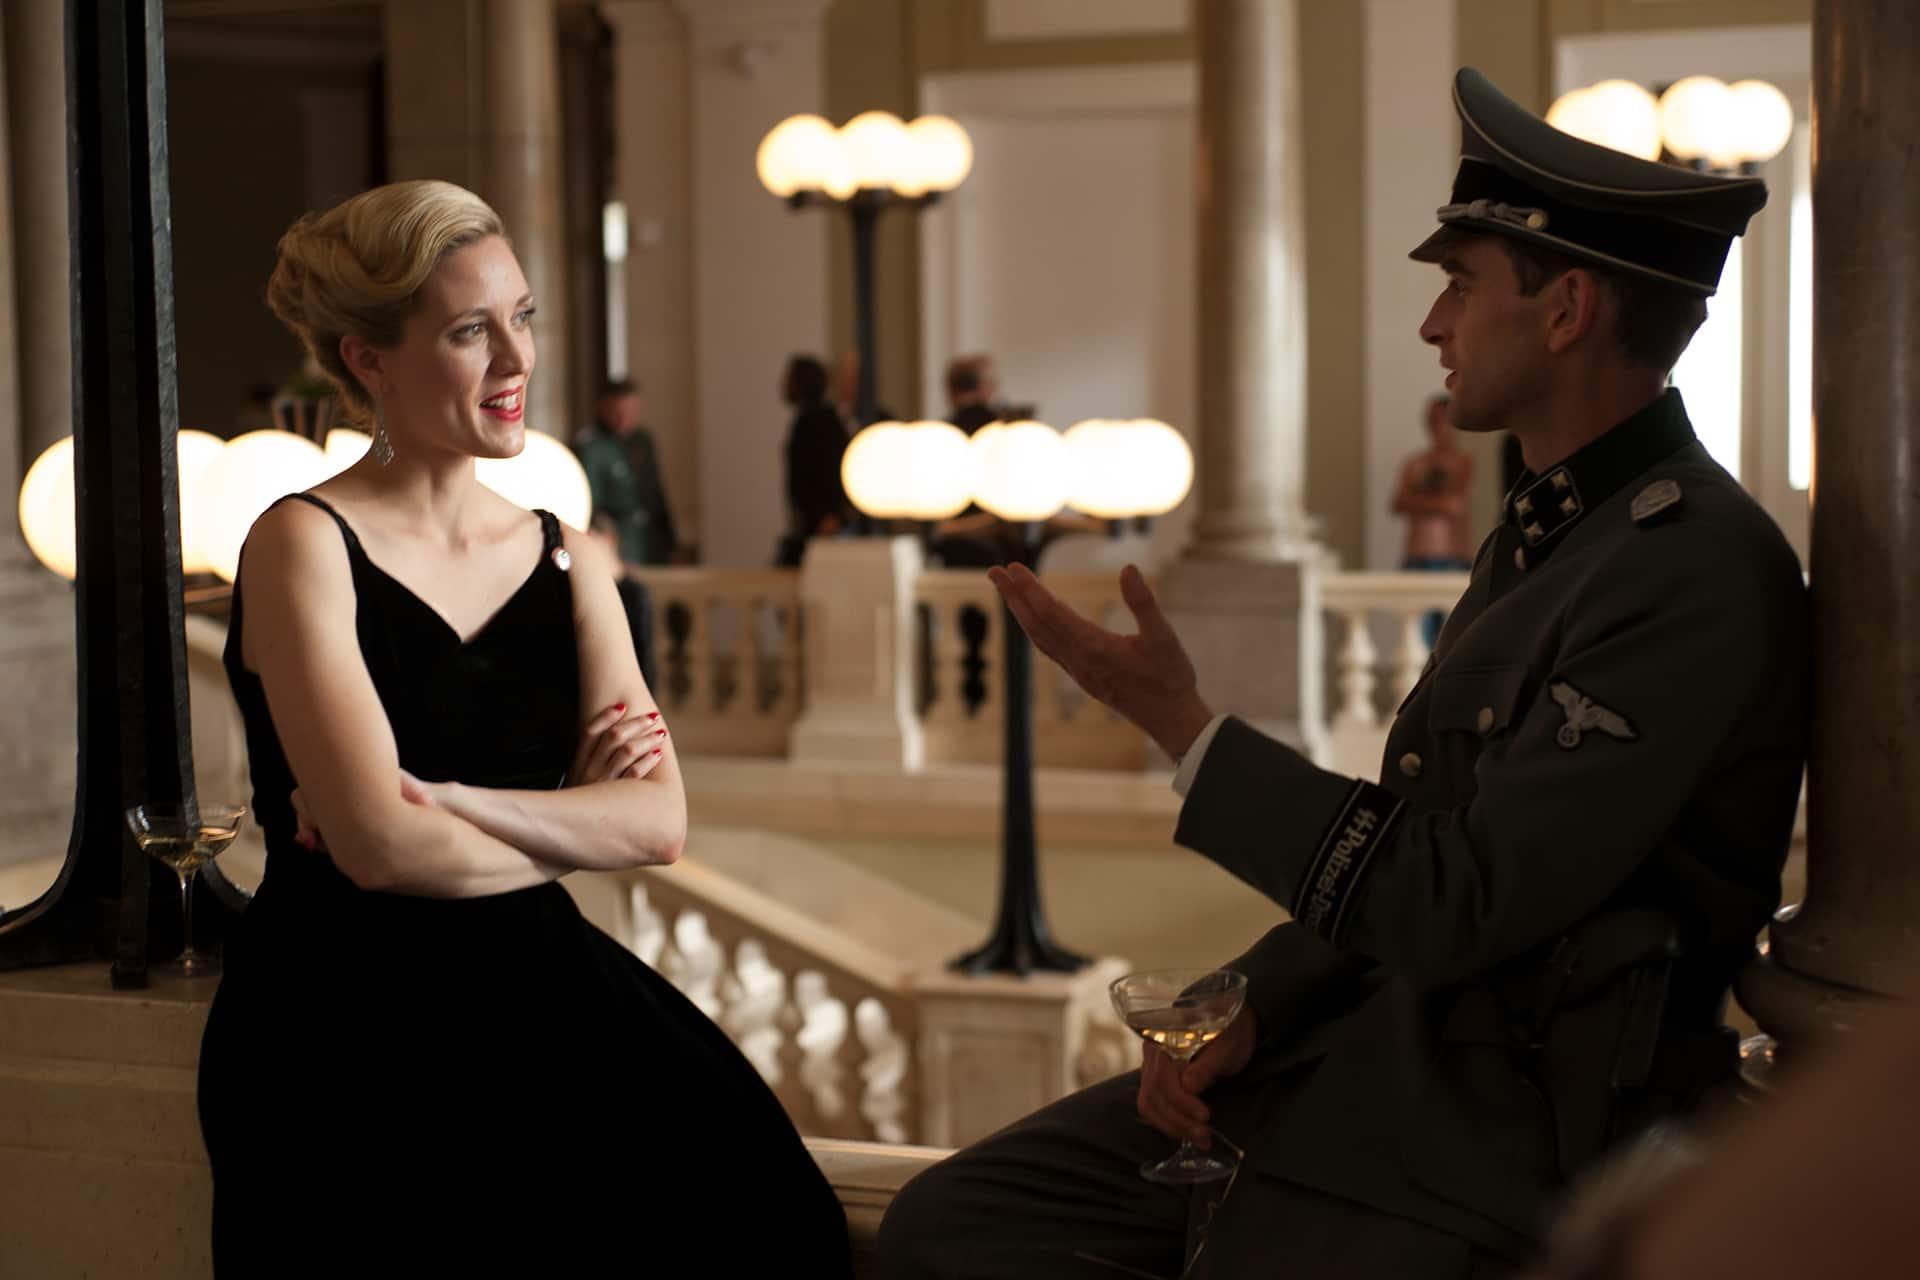 Evelyne Brochu (Aurora) and Jack Laskey (Alfred) take a break on the set of X Company Season 3 shooting in Budapest, Hungary.